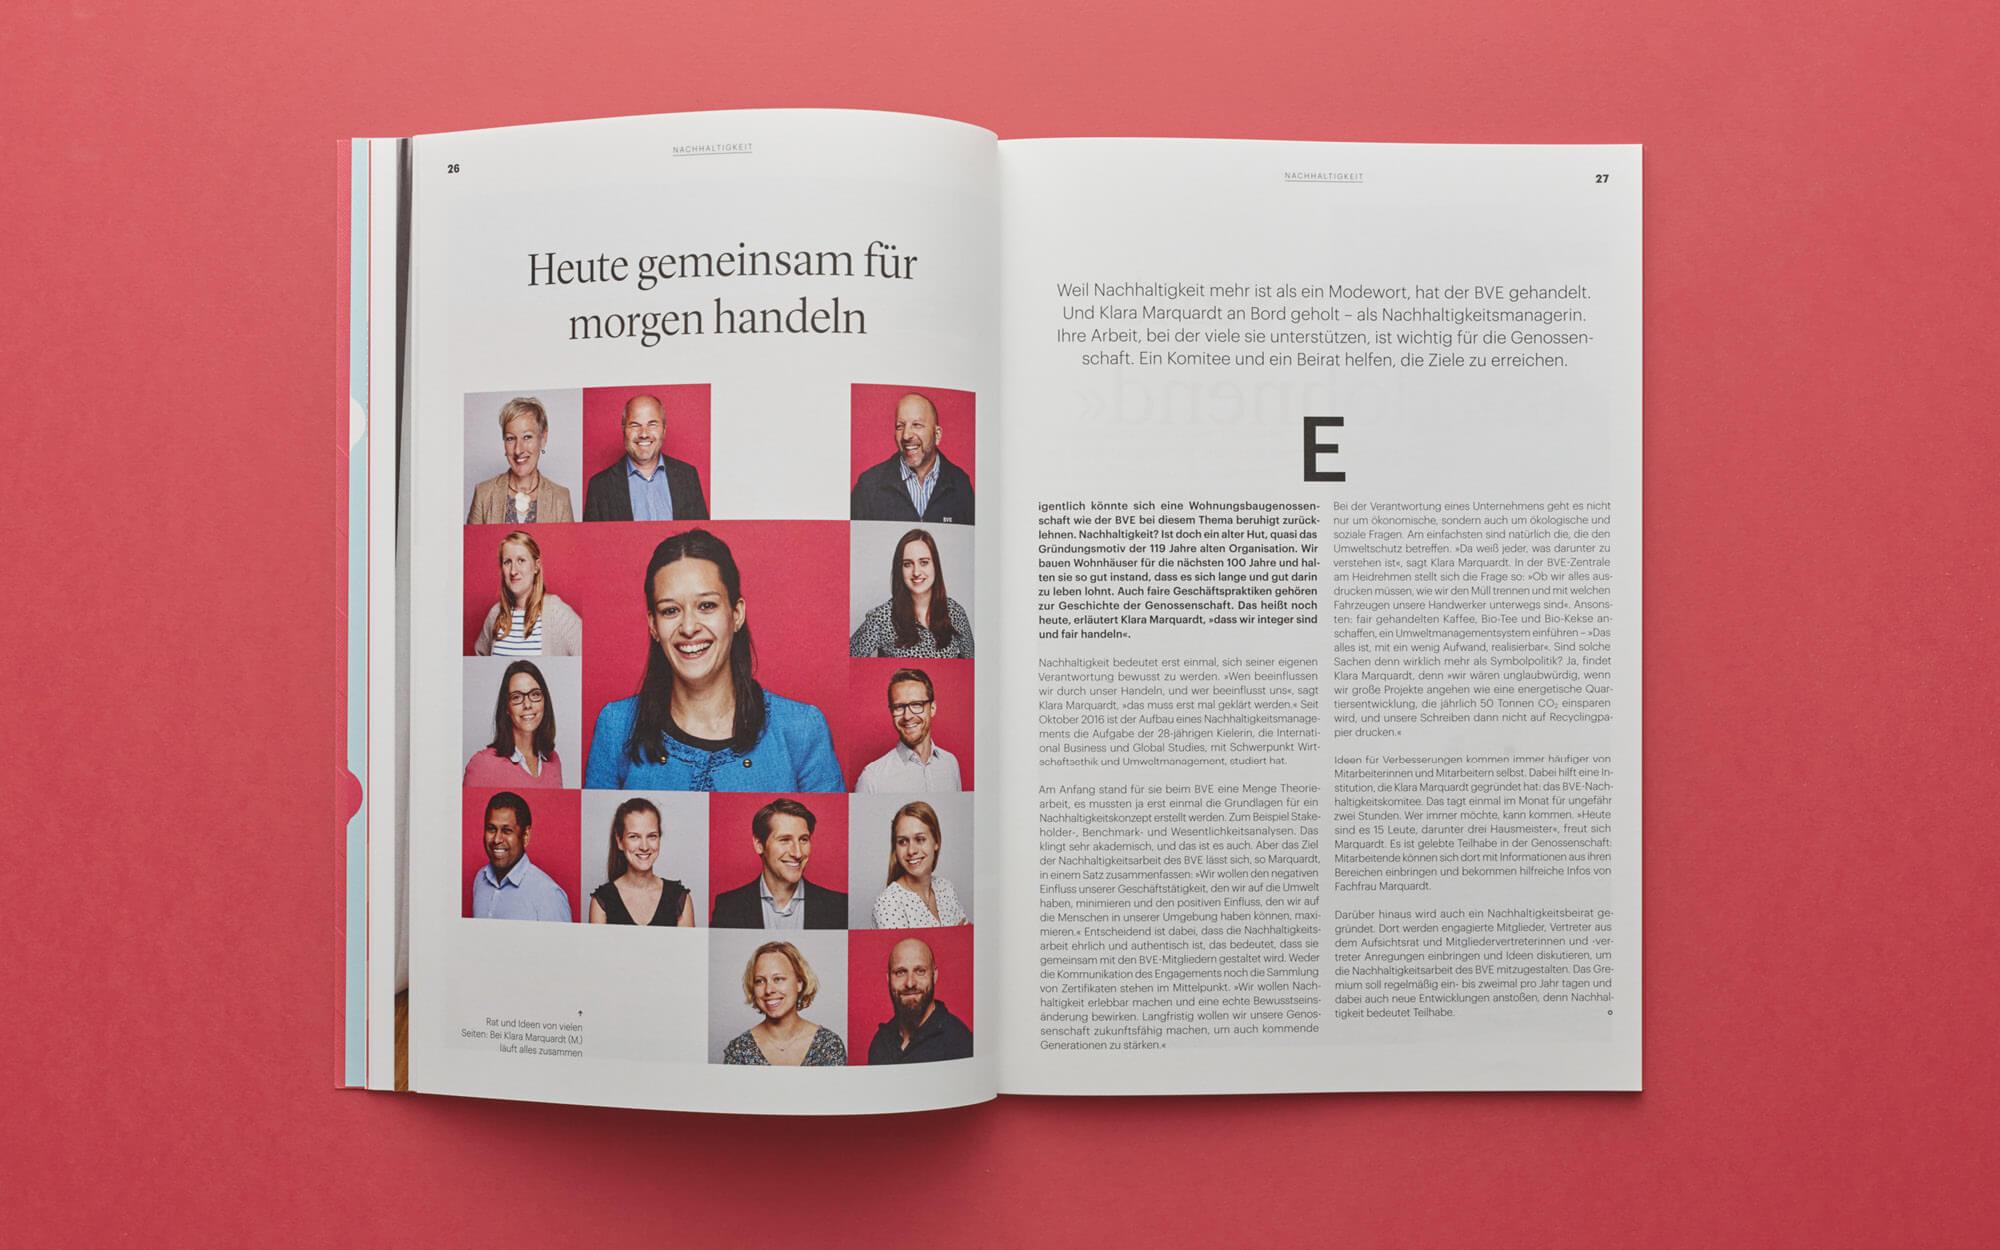 EIGA_BVE_annual-report2017_L_01